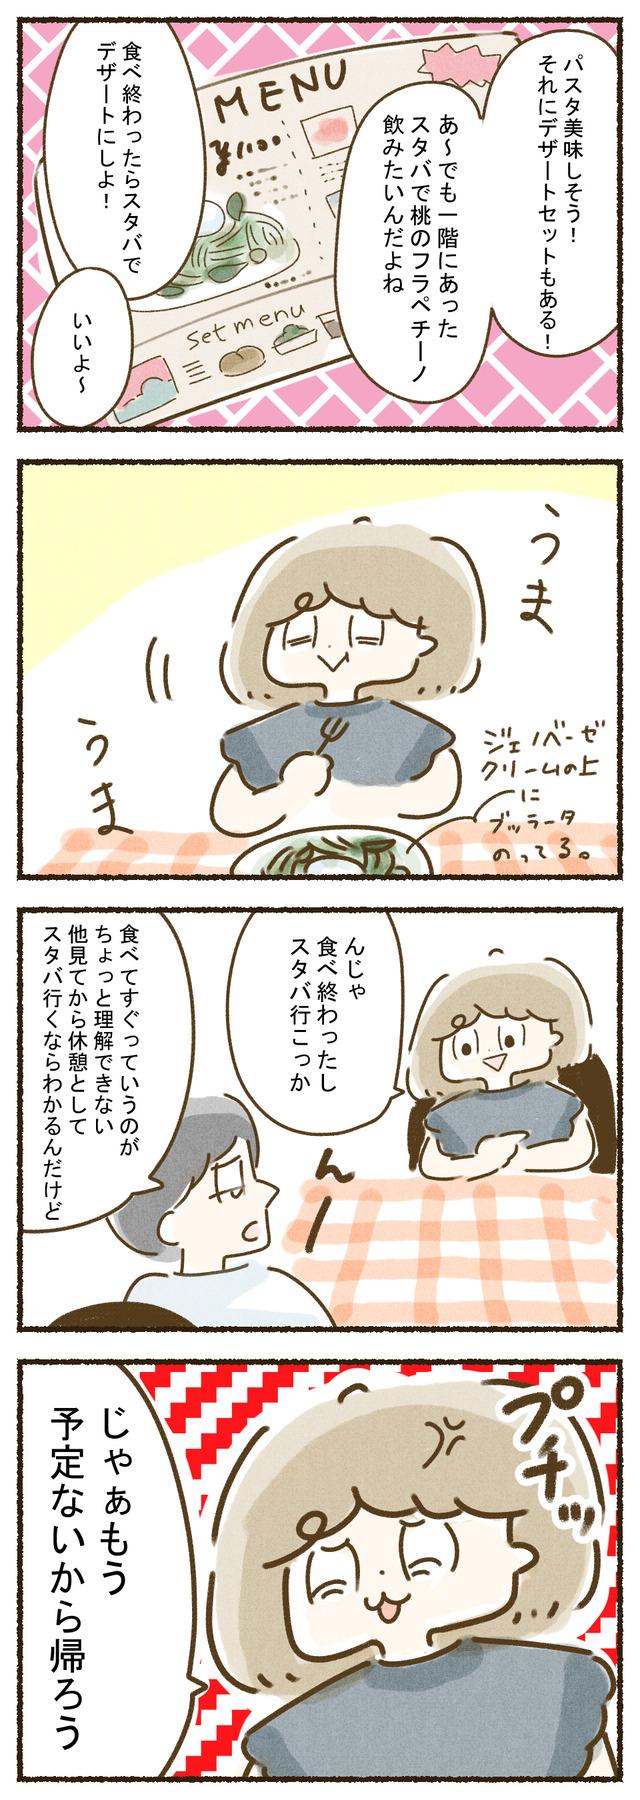 toshimaentokenkato02